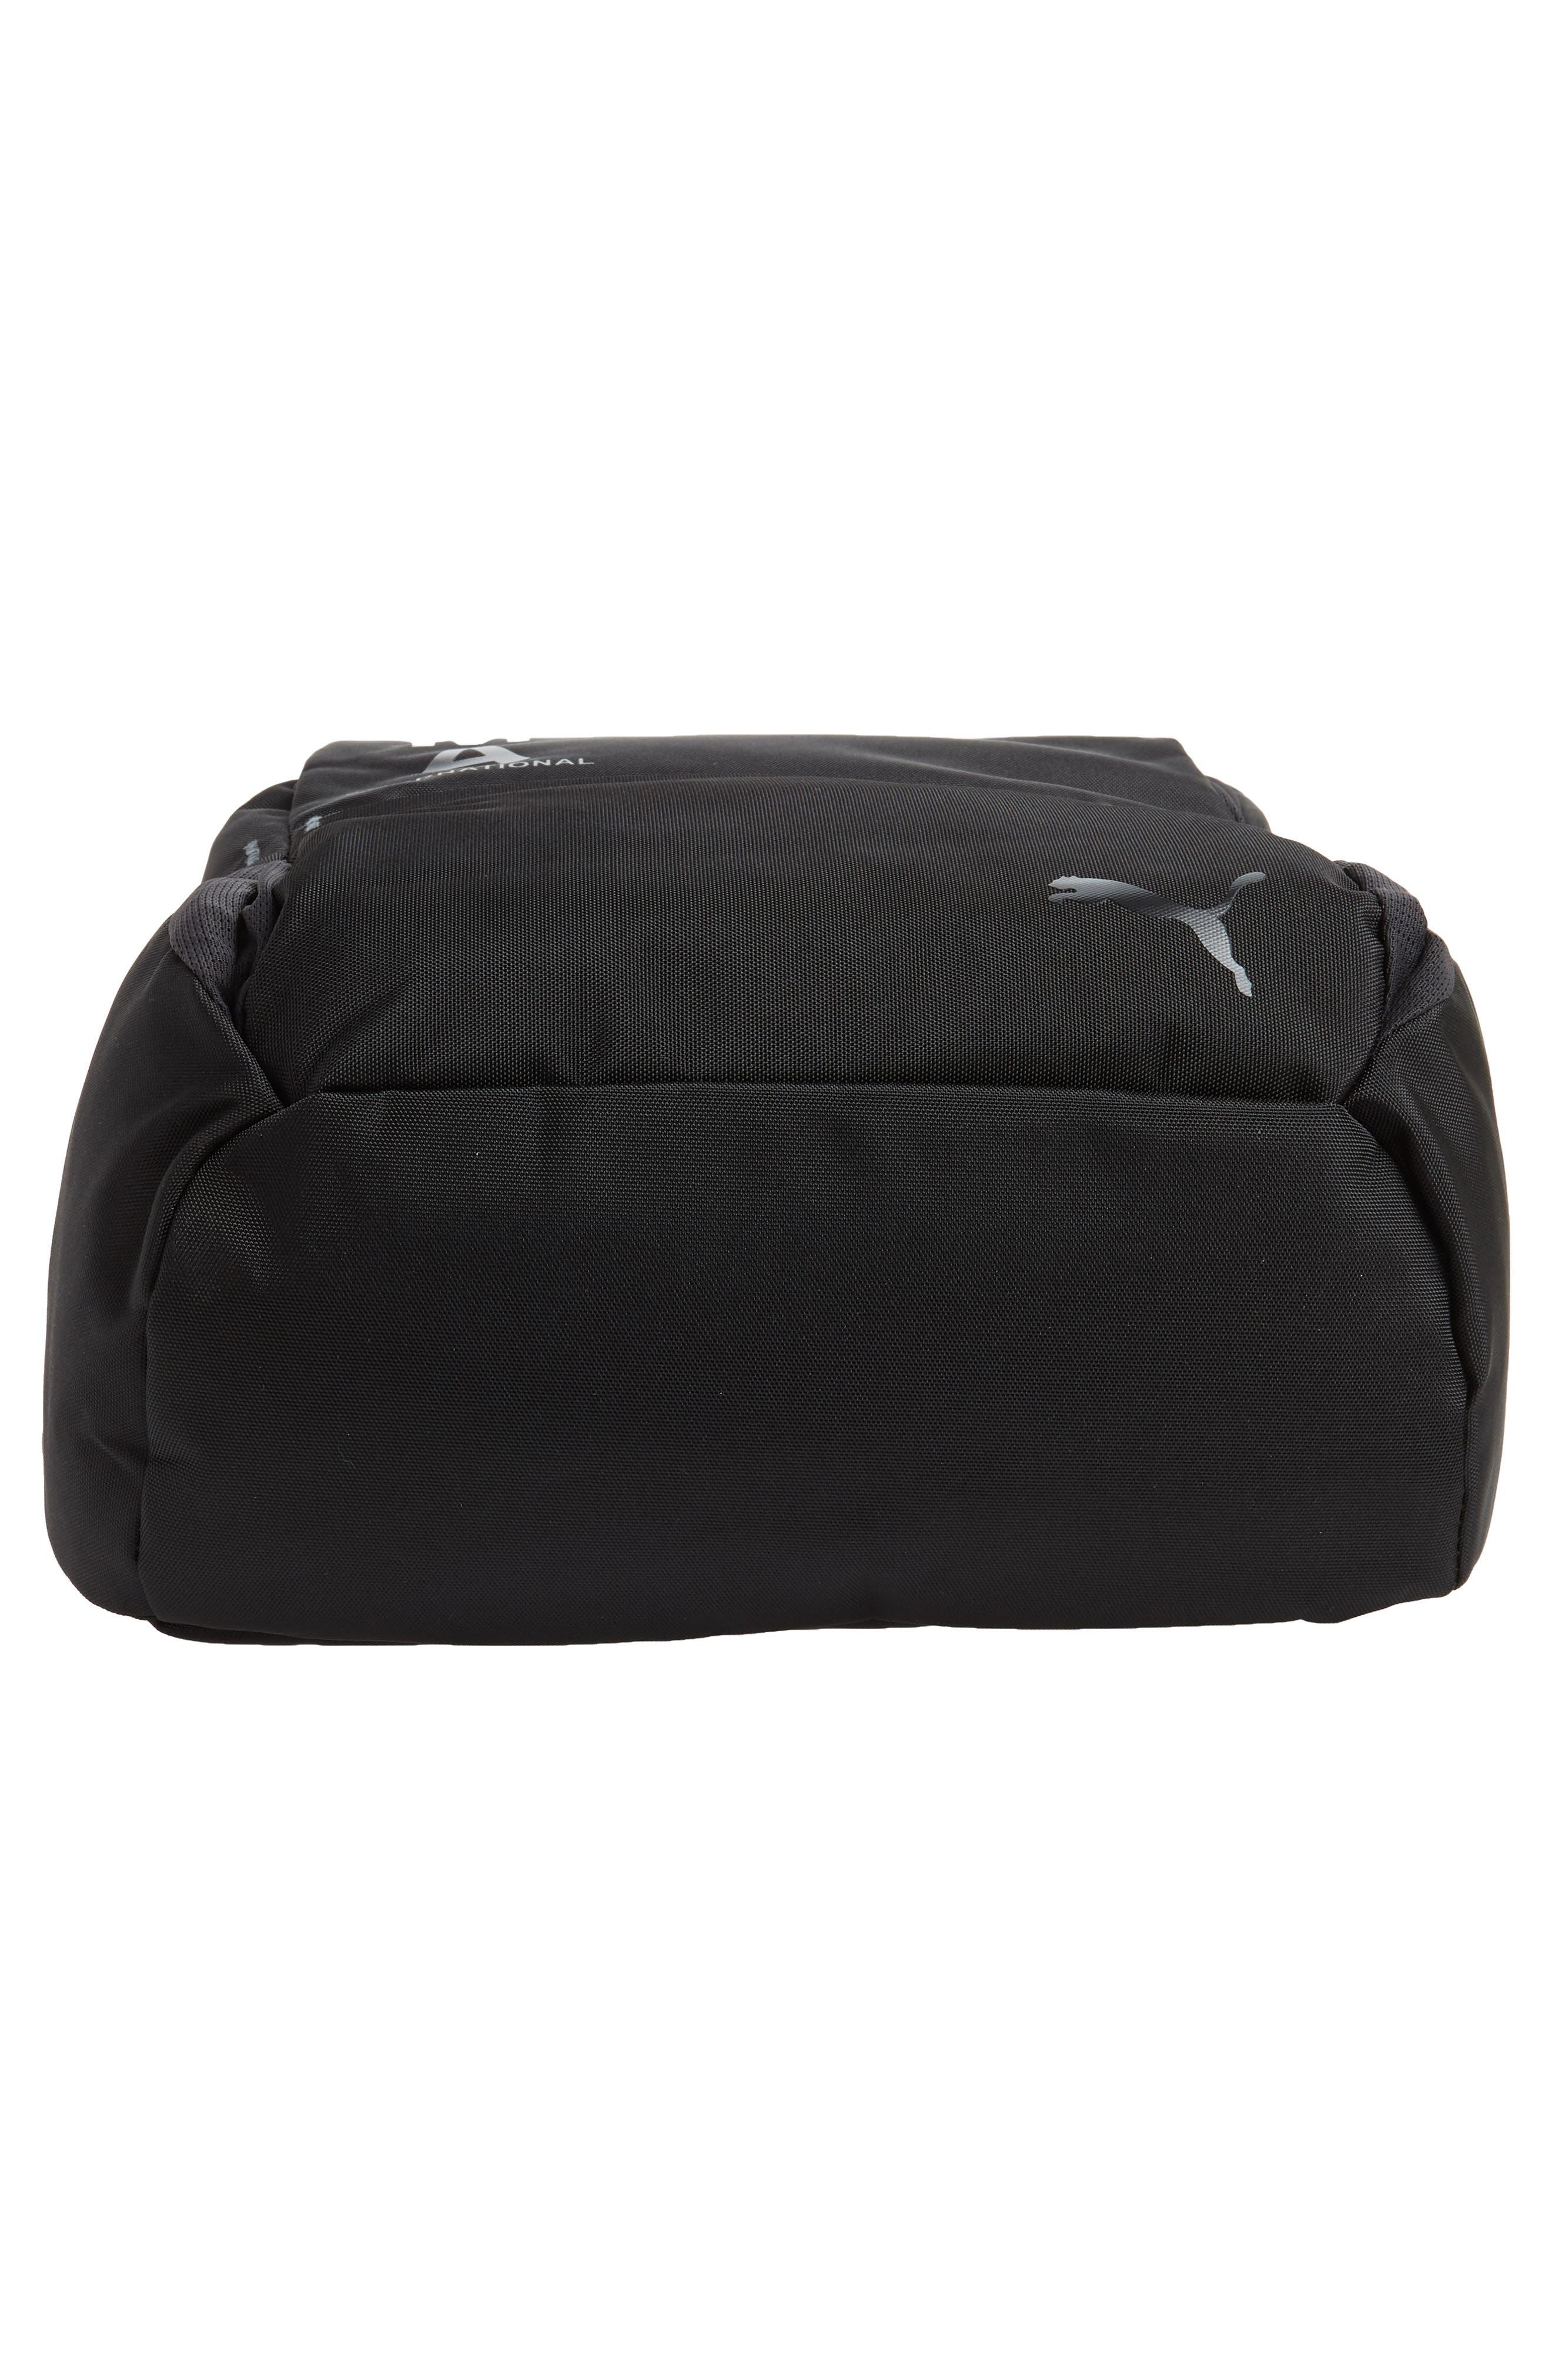 Ace Backpack,                             Alternate thumbnail 6, color,                             BLACK